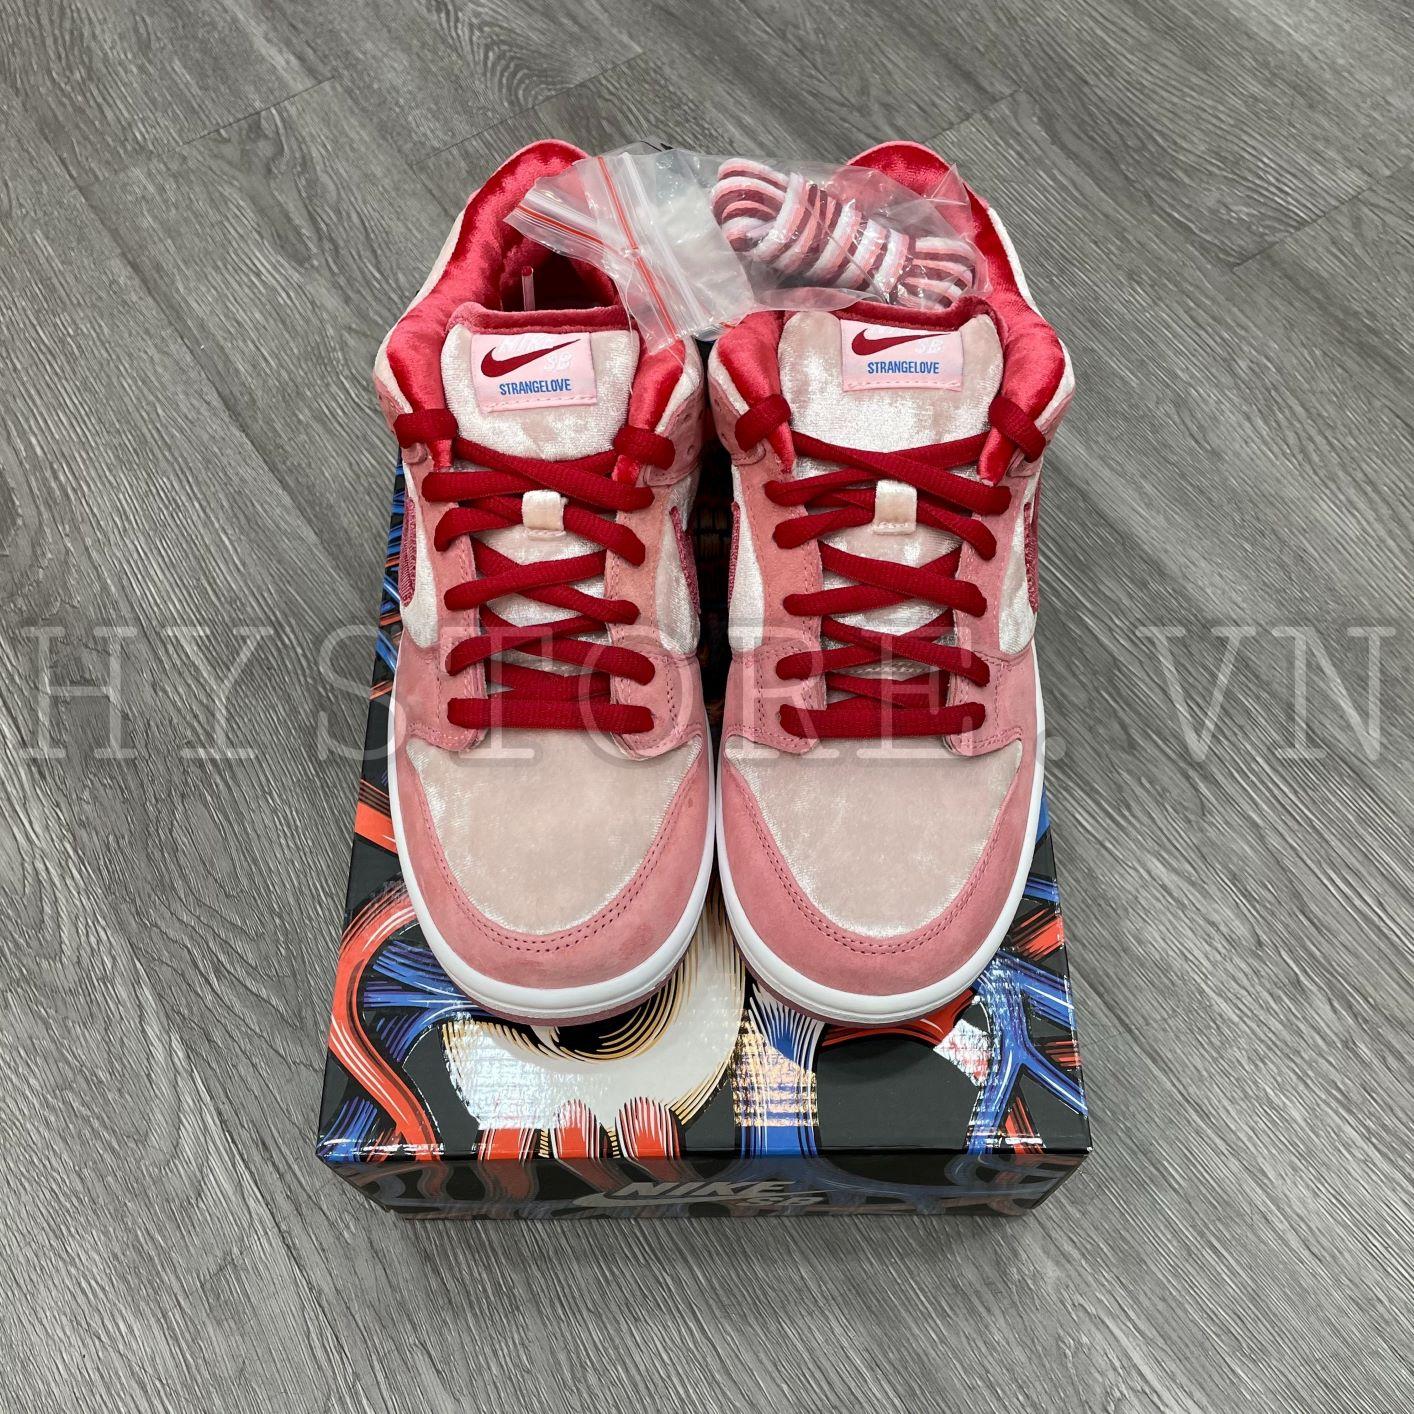 Giày Nike SB Dunk low Strangelove